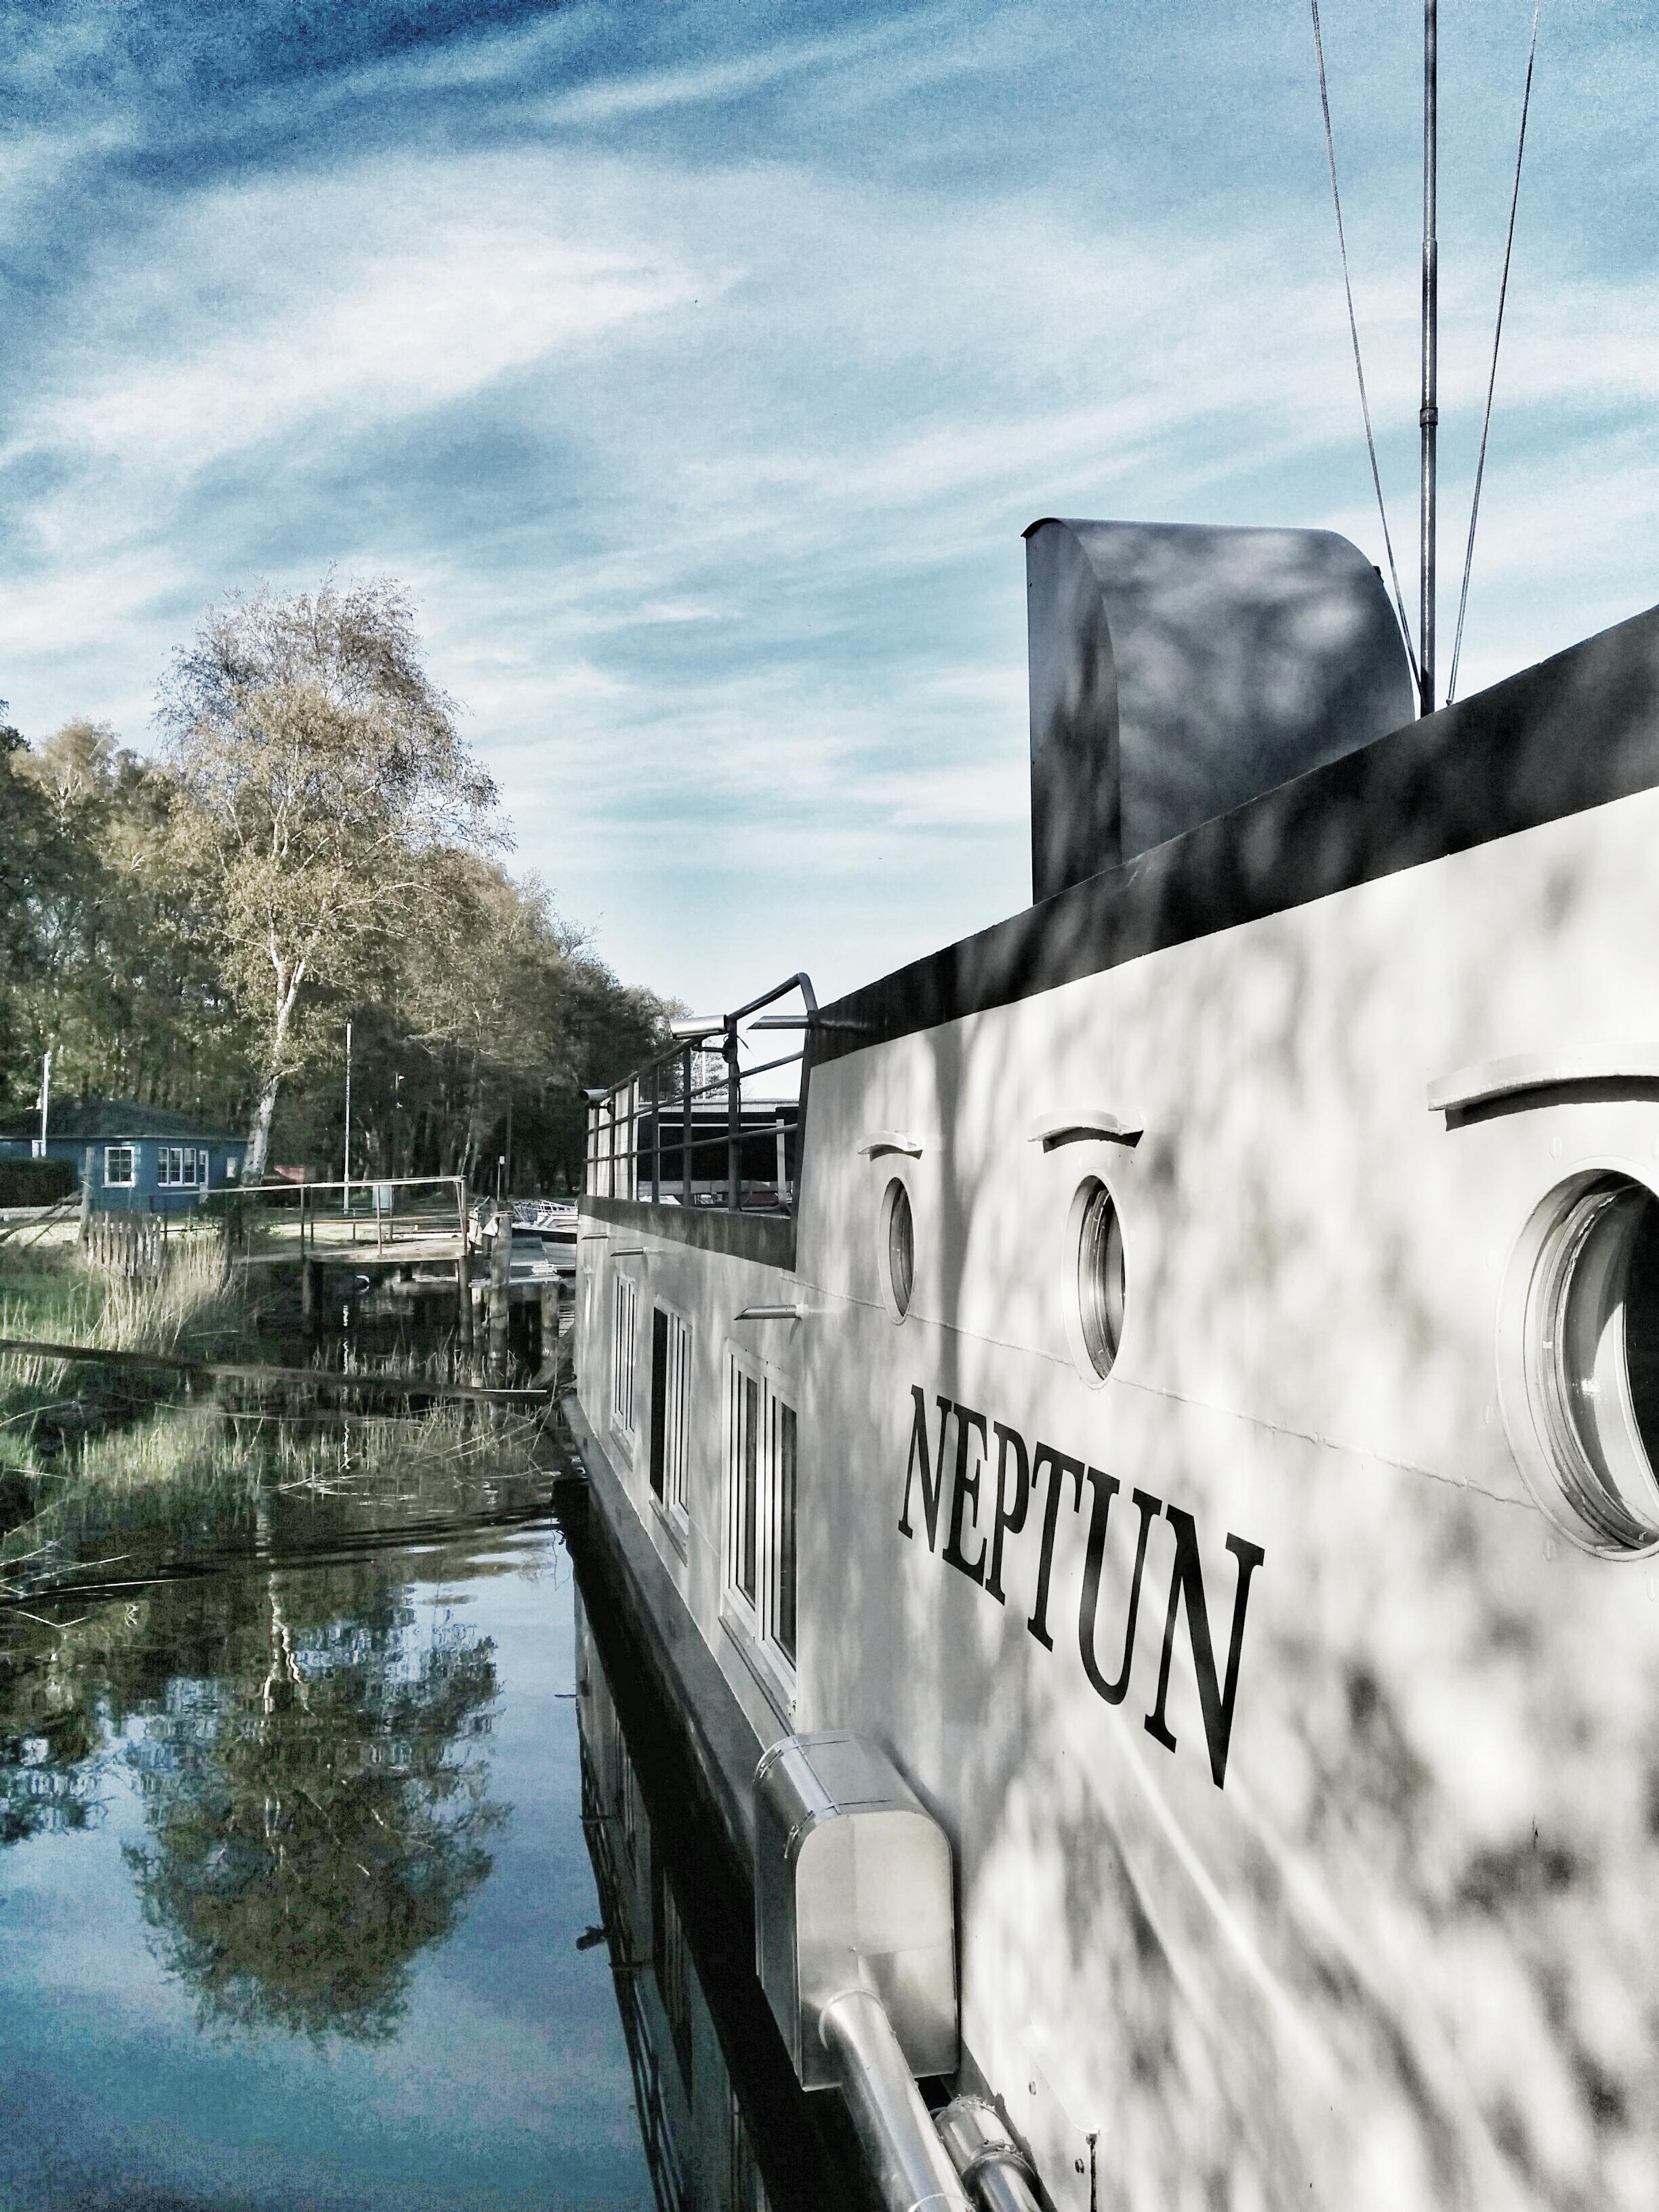 Wohnschiff Neptun an der Ostsee